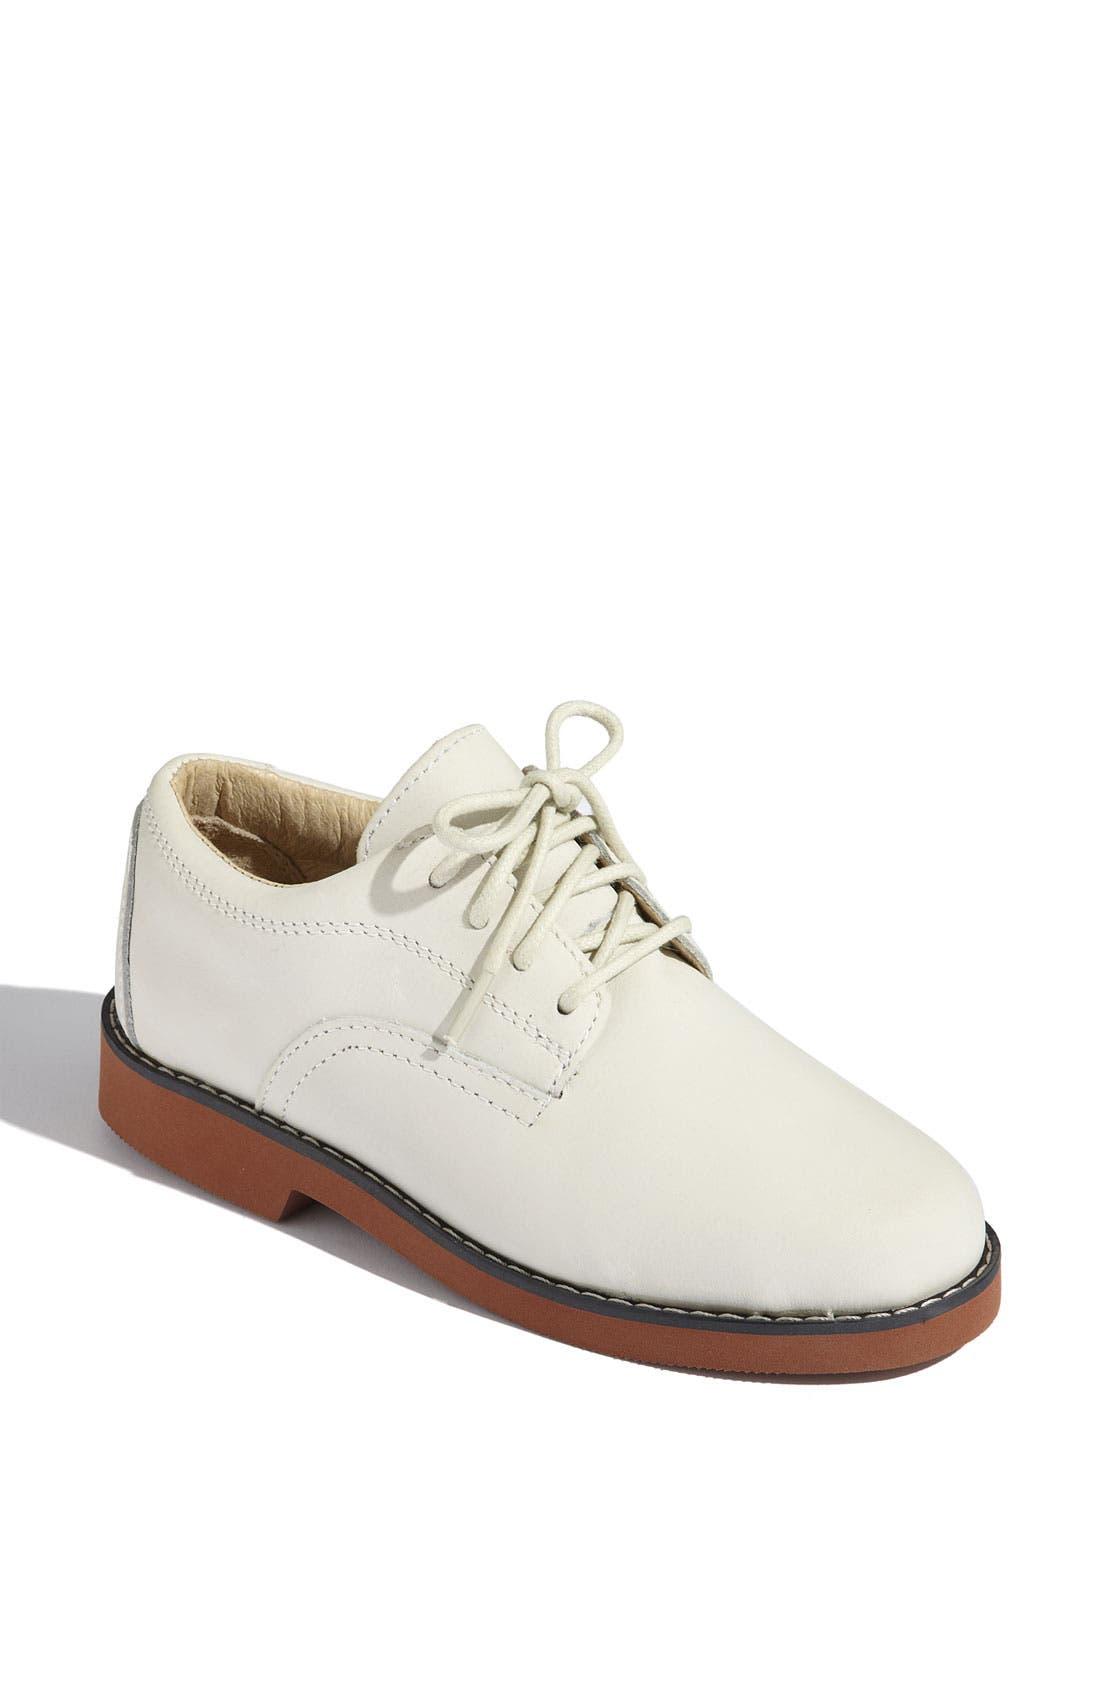 Alternate Image 1 Selected - Jumping Jacks 'Buck' Oxford Shoe (Toddler, Little Kid & Big Kid)